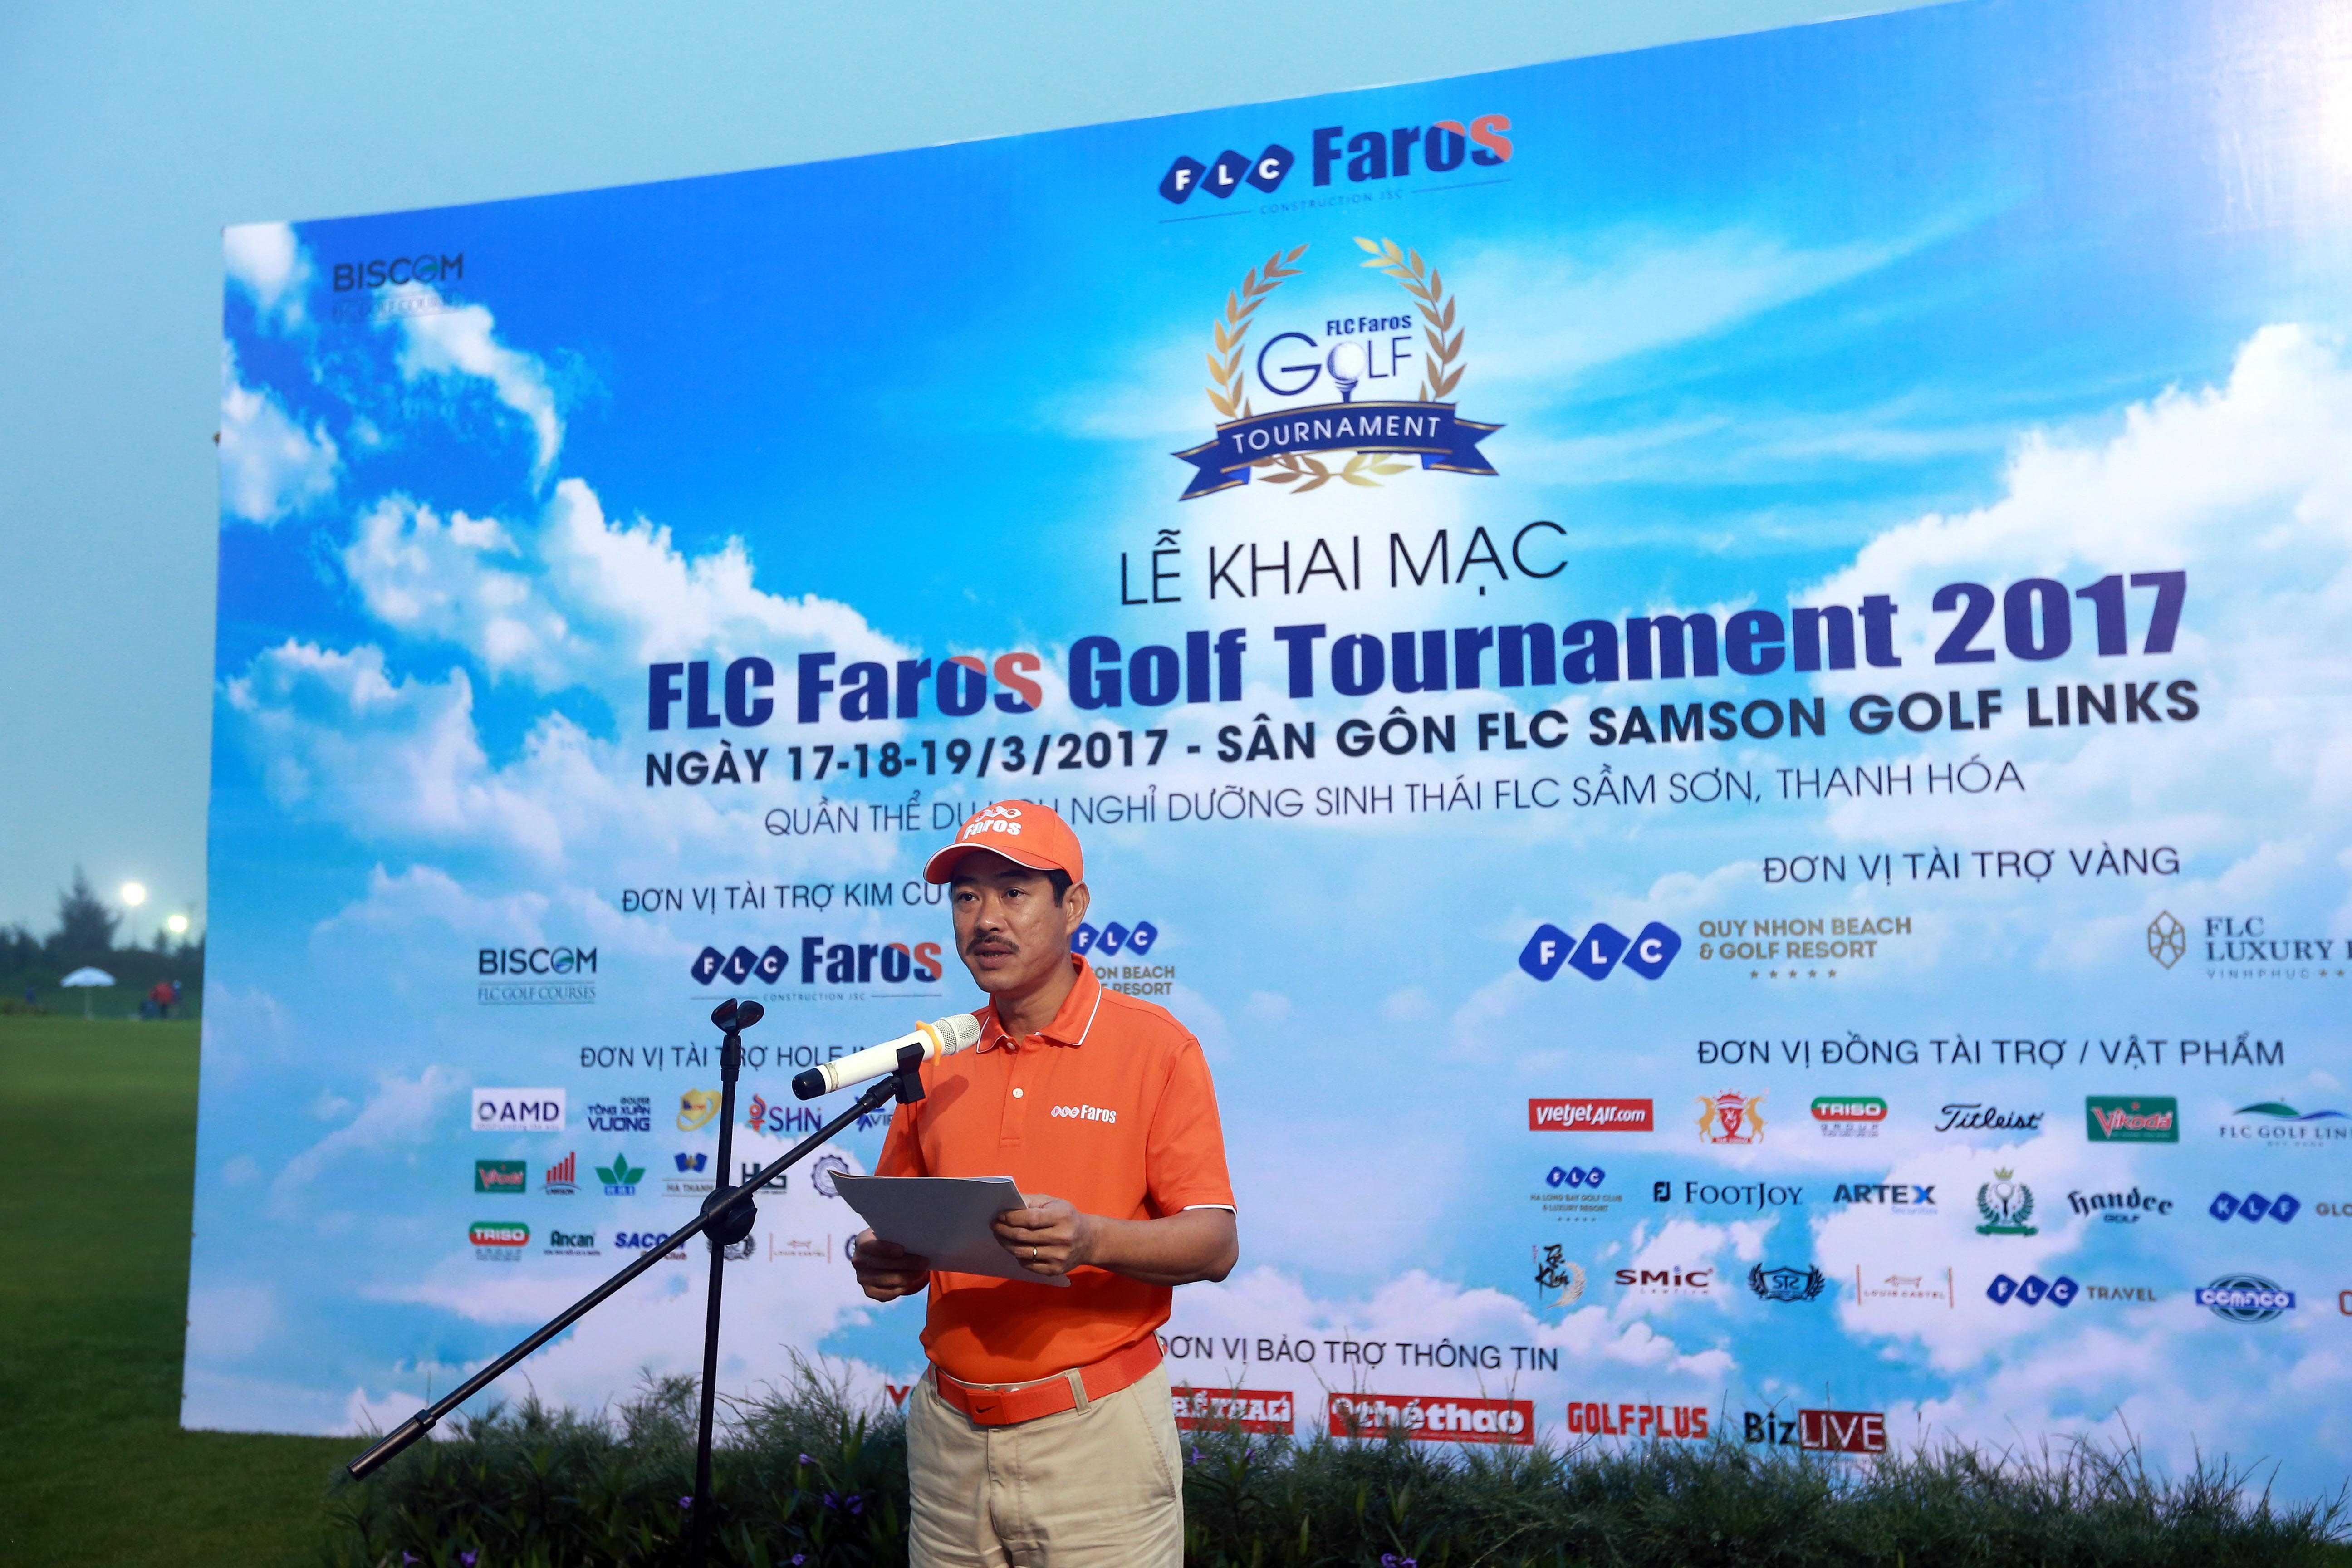 Hon 1200 golfer tranh tai tai FLC Faros Golf Tournament 2017 hinh anh 4